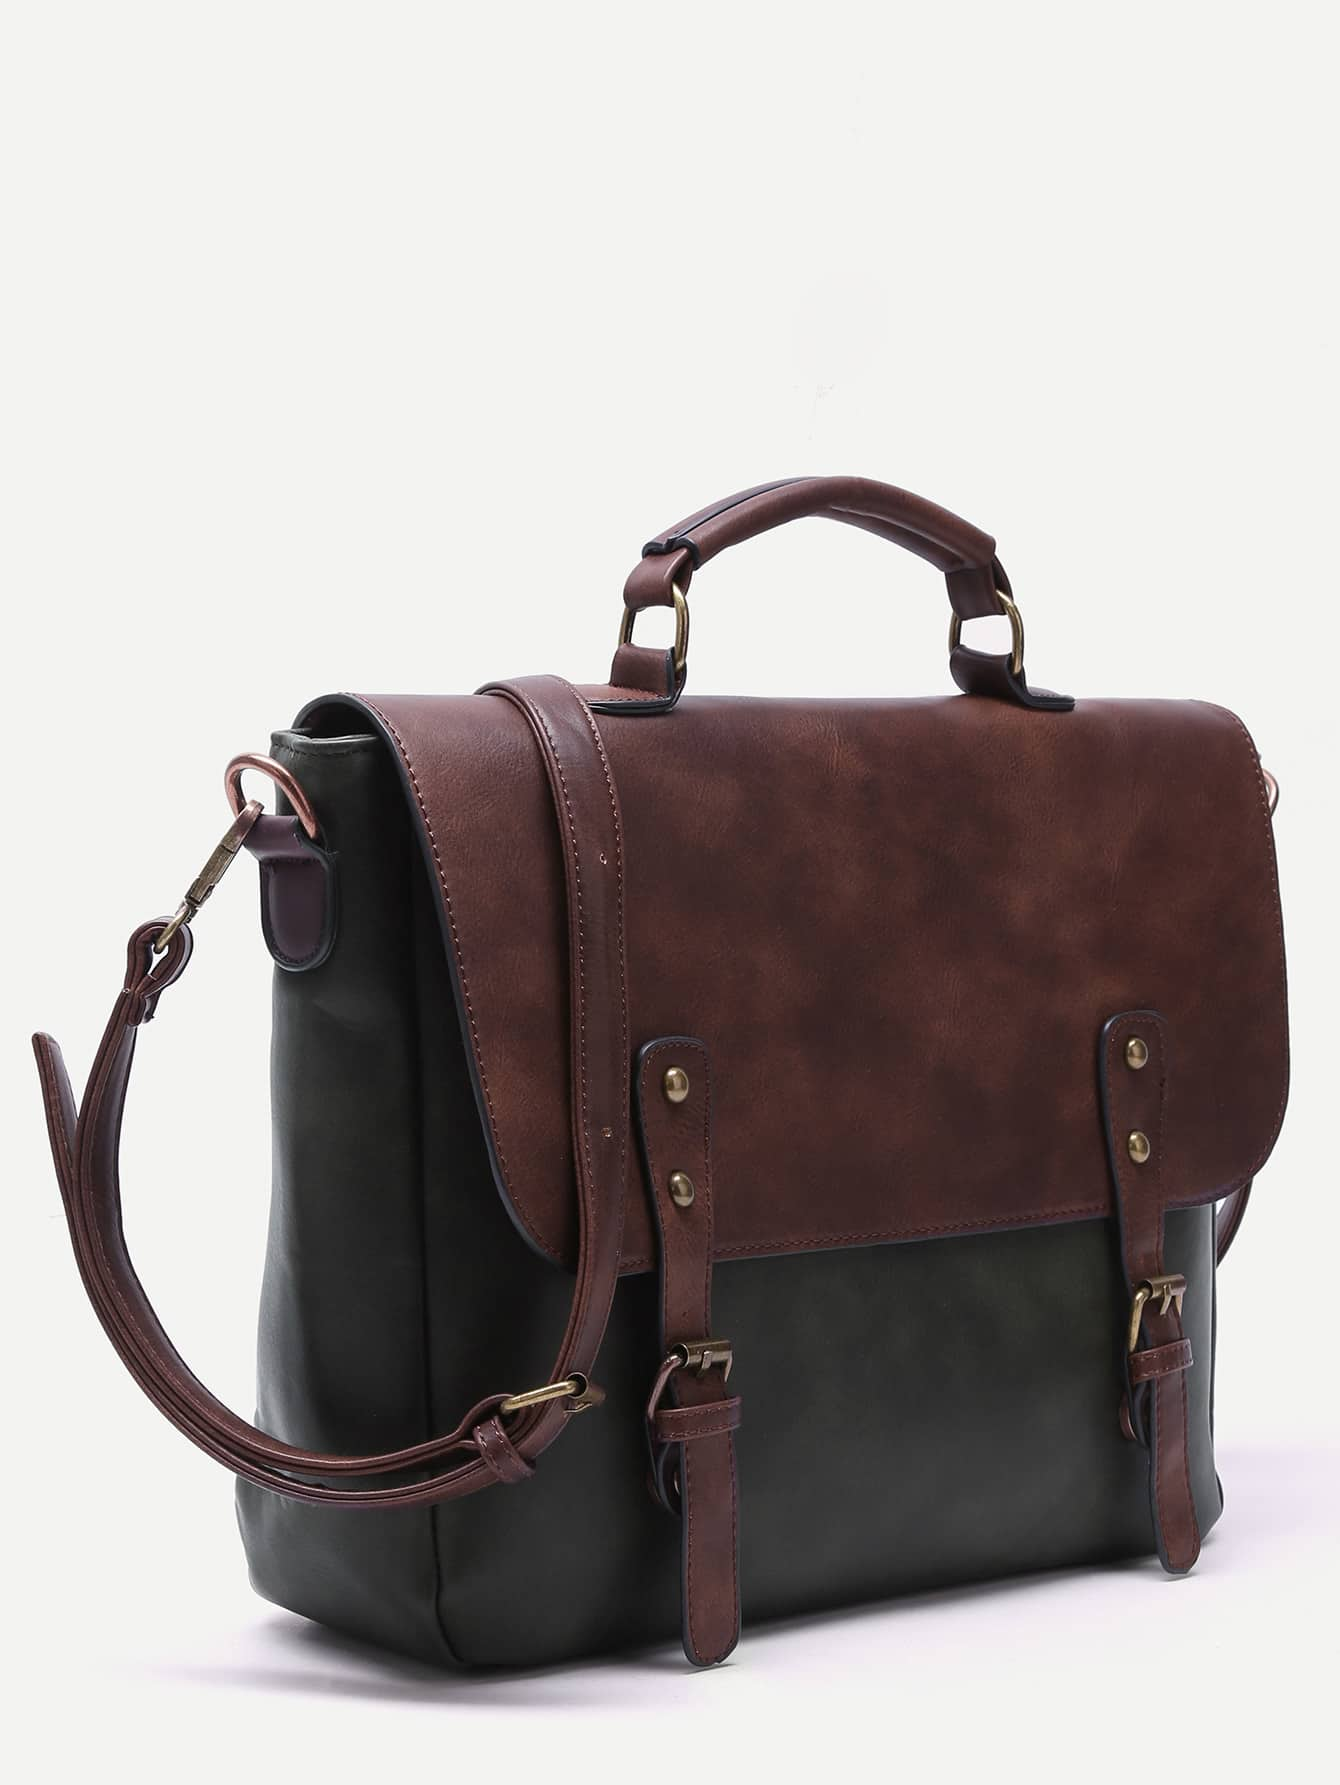 bag160921914_2 - Sac A Main Color